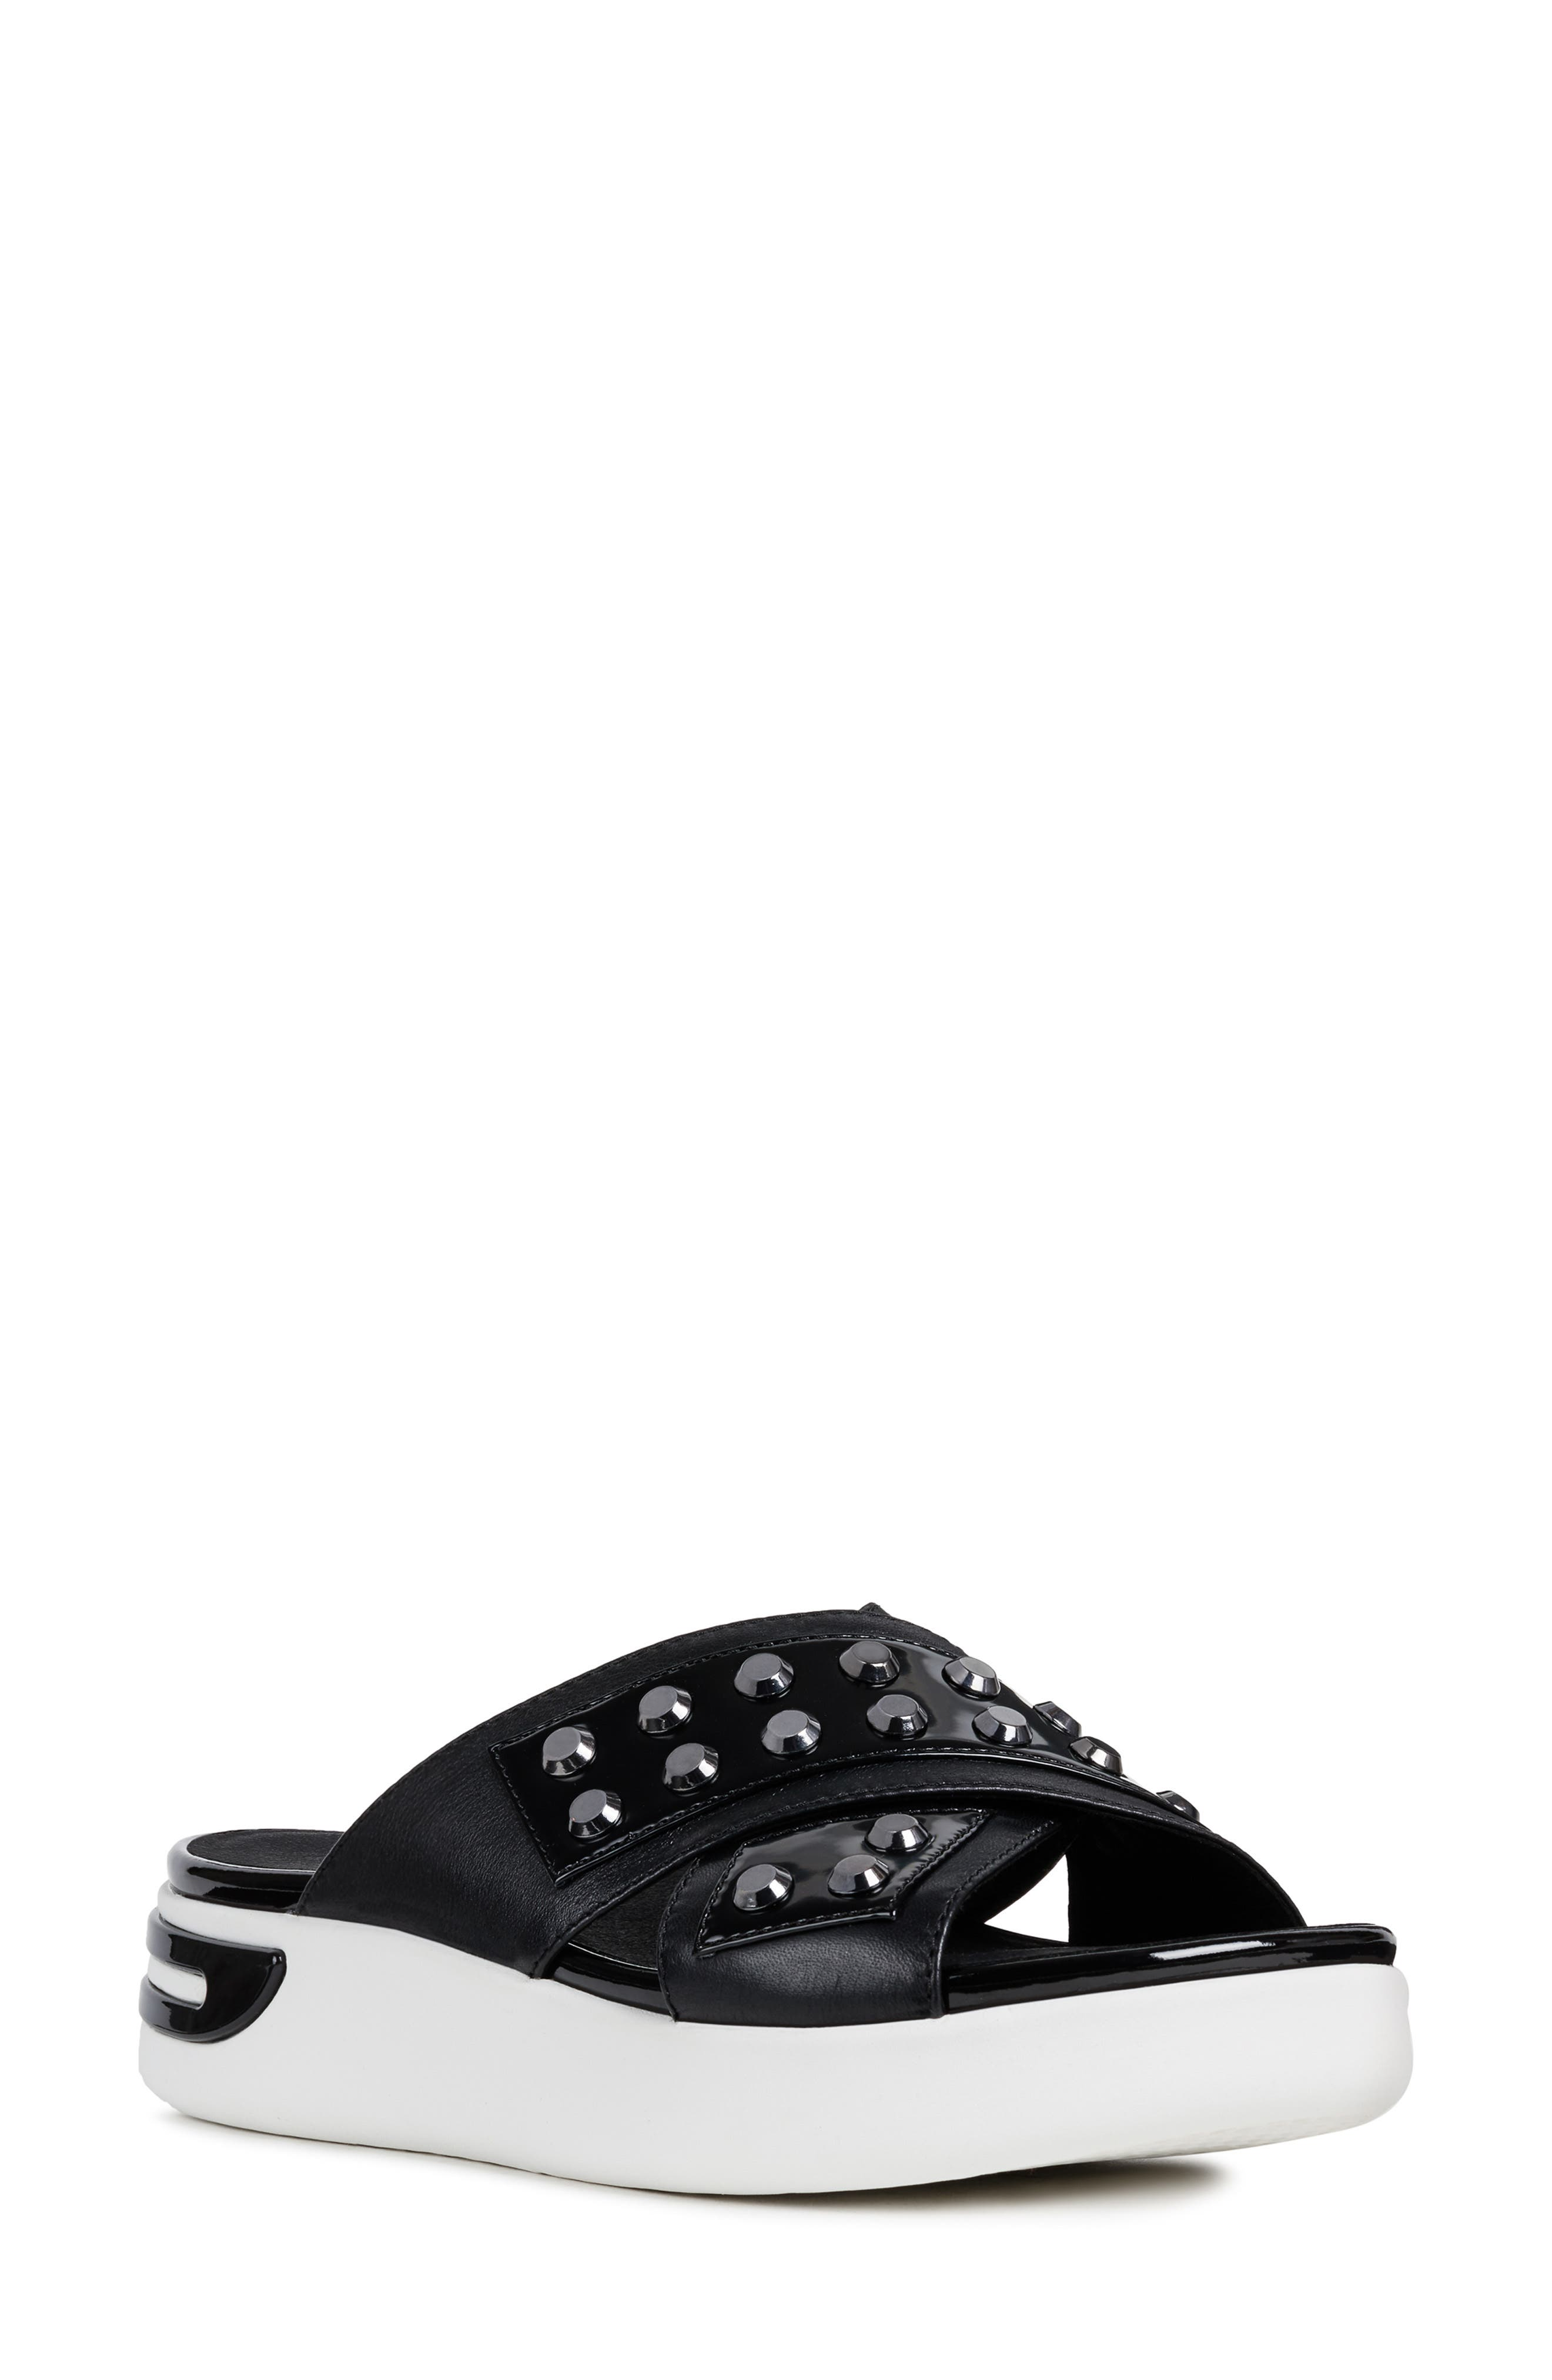 65b1062c4e5f3 Geox Ottaya Studded Slide Sandal, Black